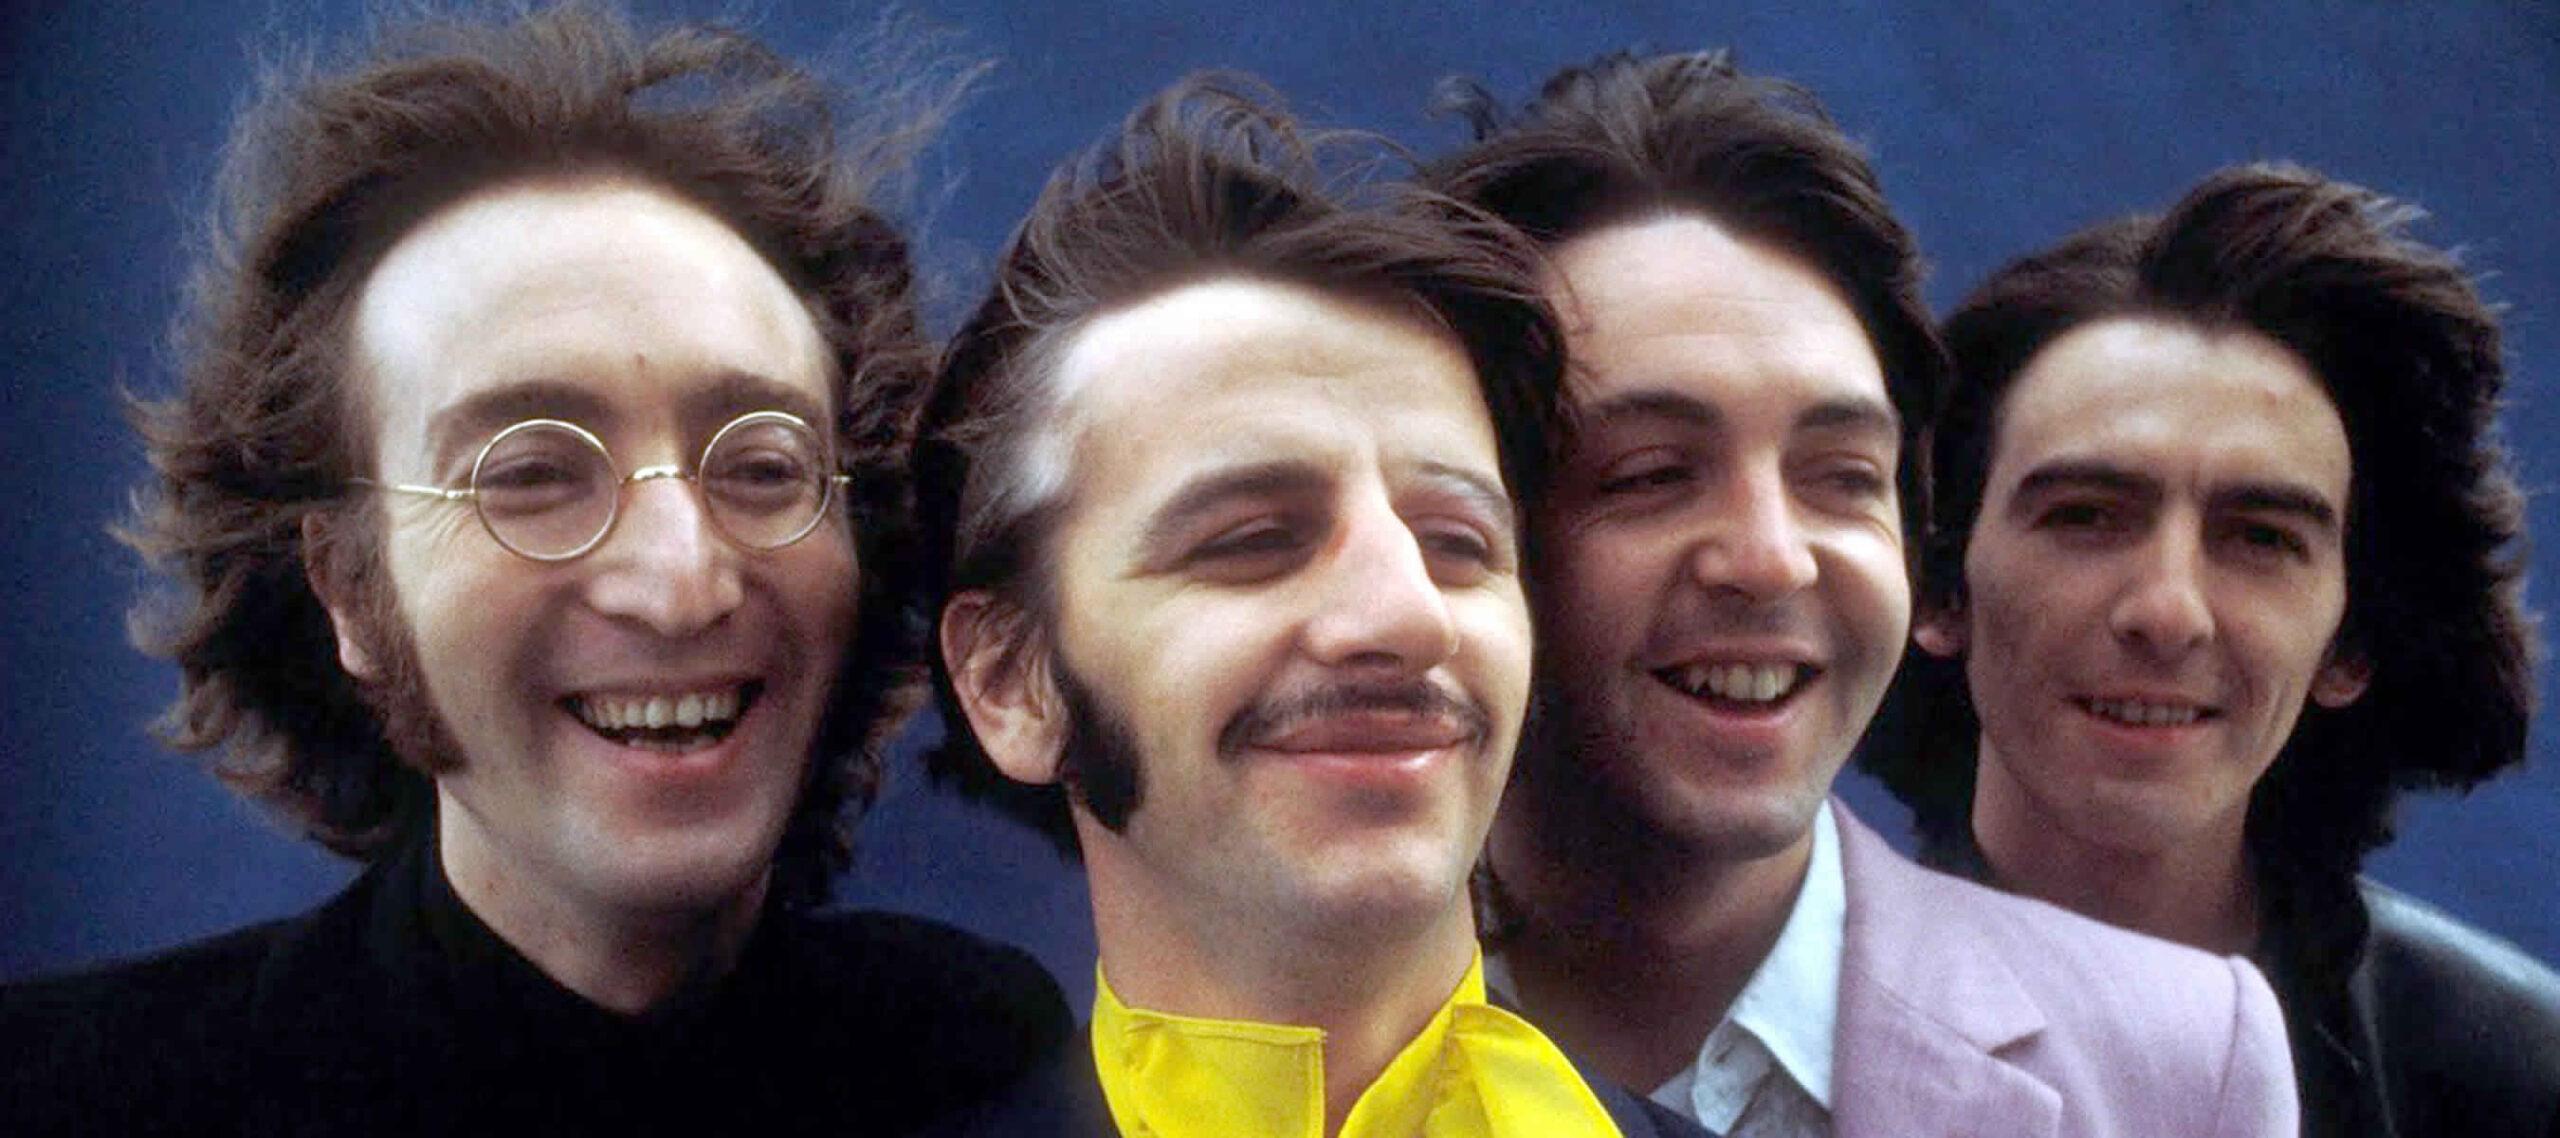 Tributo a The Beatles - smoking molly